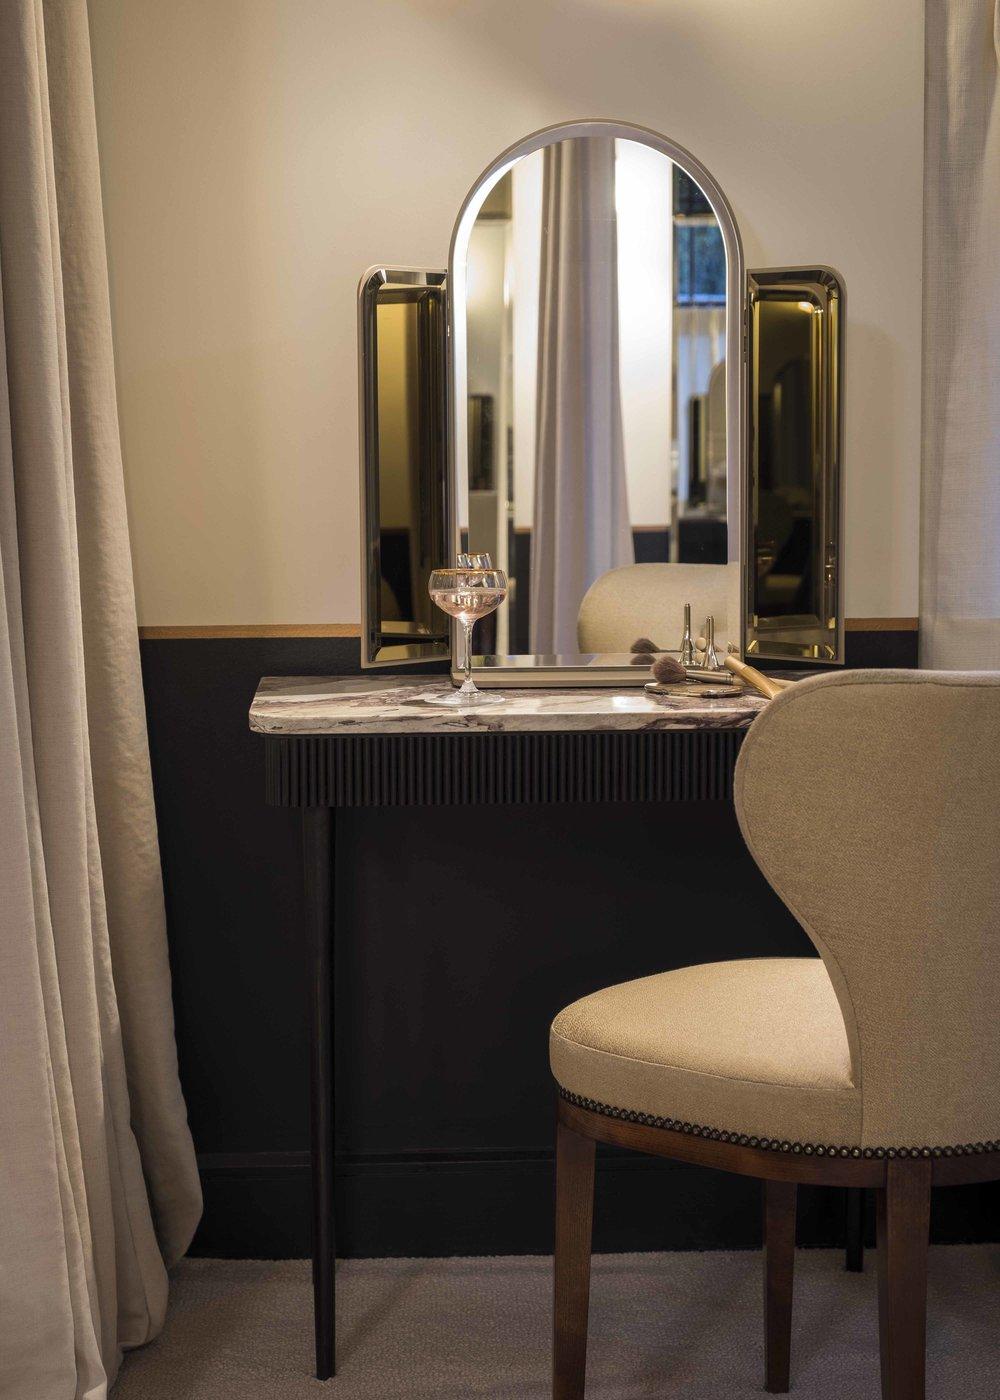 Bob & Coche_Make Up Room_Lind + Almond.jpg